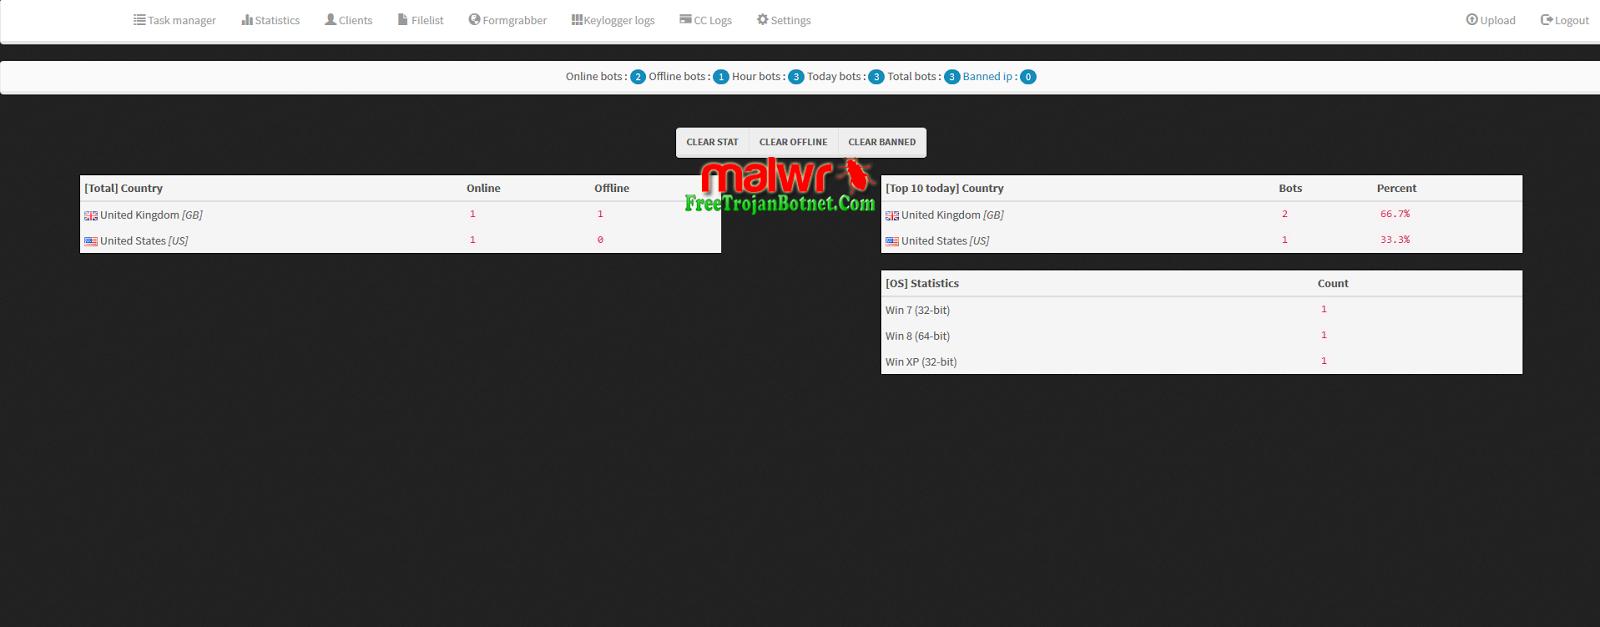 Binare optionen programm analyse tools